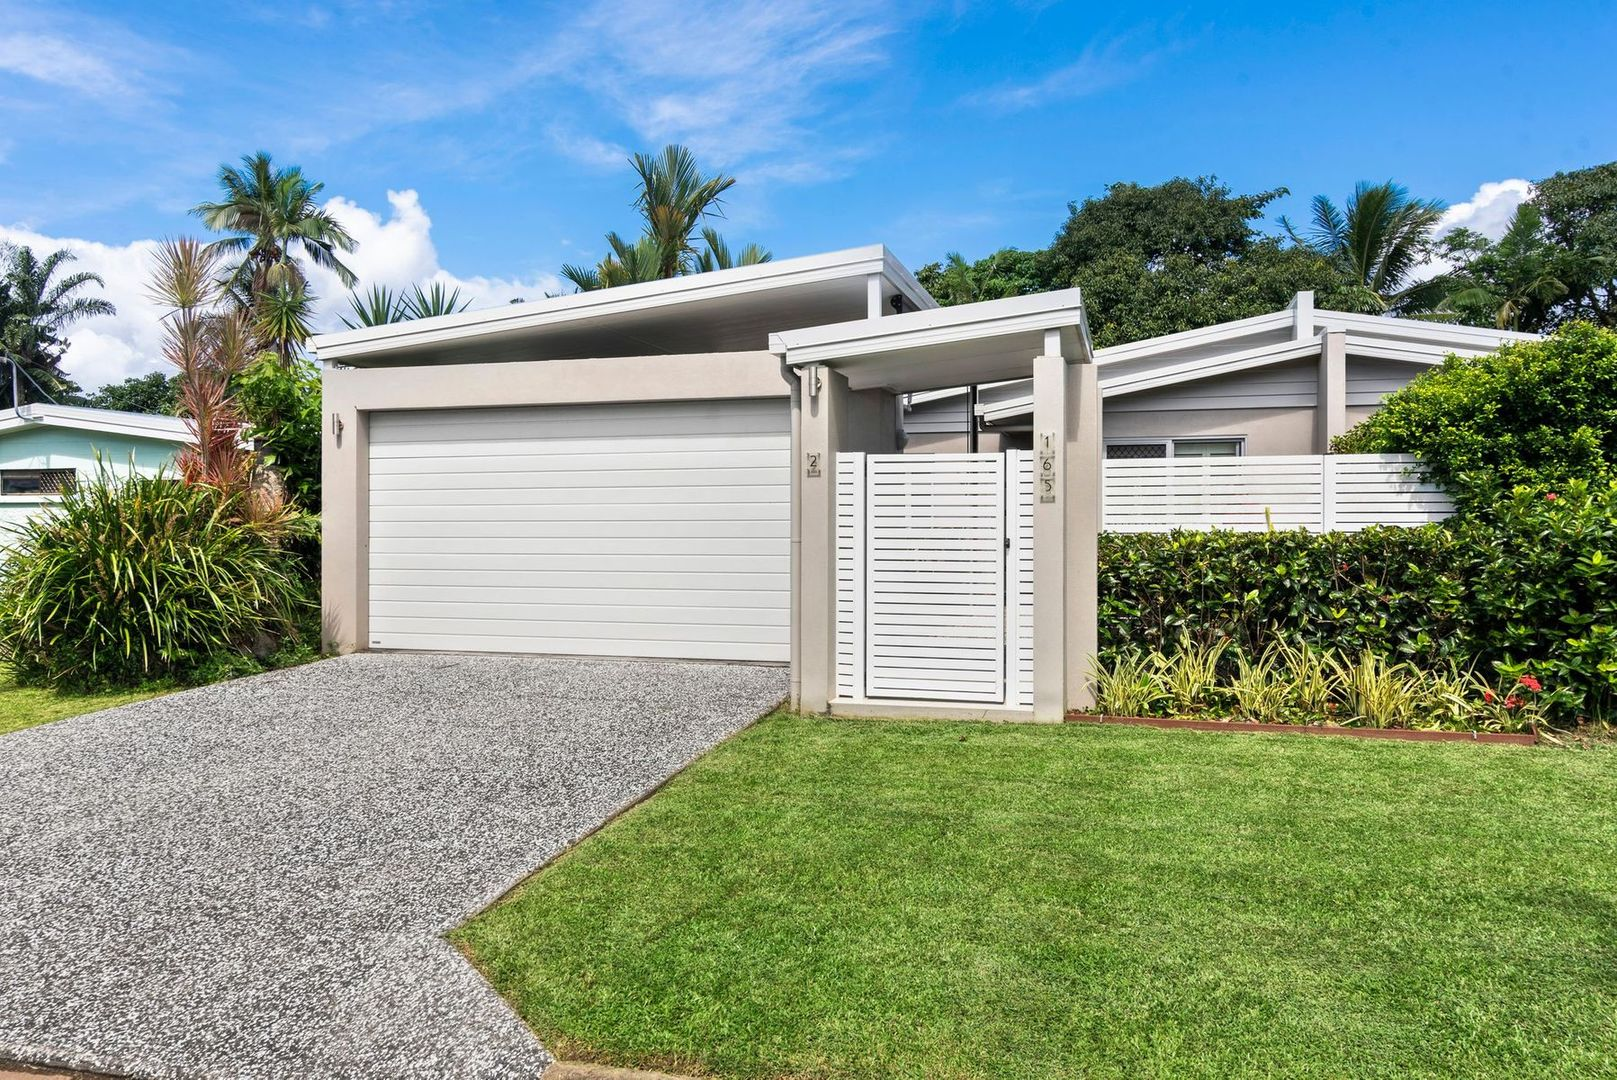 2/165 Greenslopes Street, Edge Hill QLD 4870, Image 0